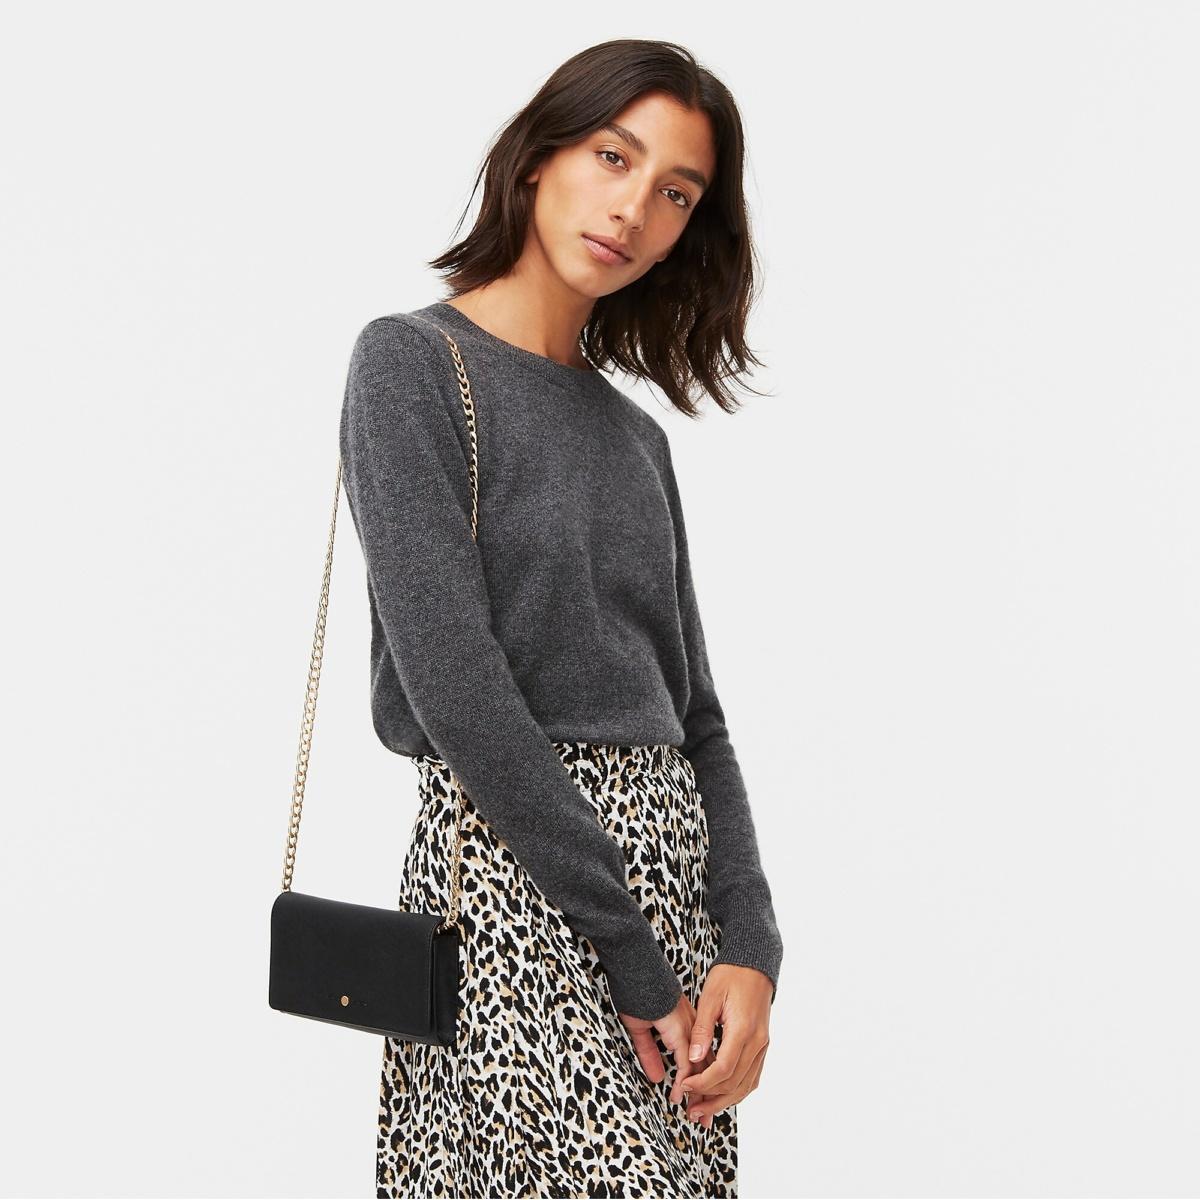 J.Crew everyday cashmere crewneck sweater charcoal heather and leopard print skirt. Details at une femme d'un certain age.